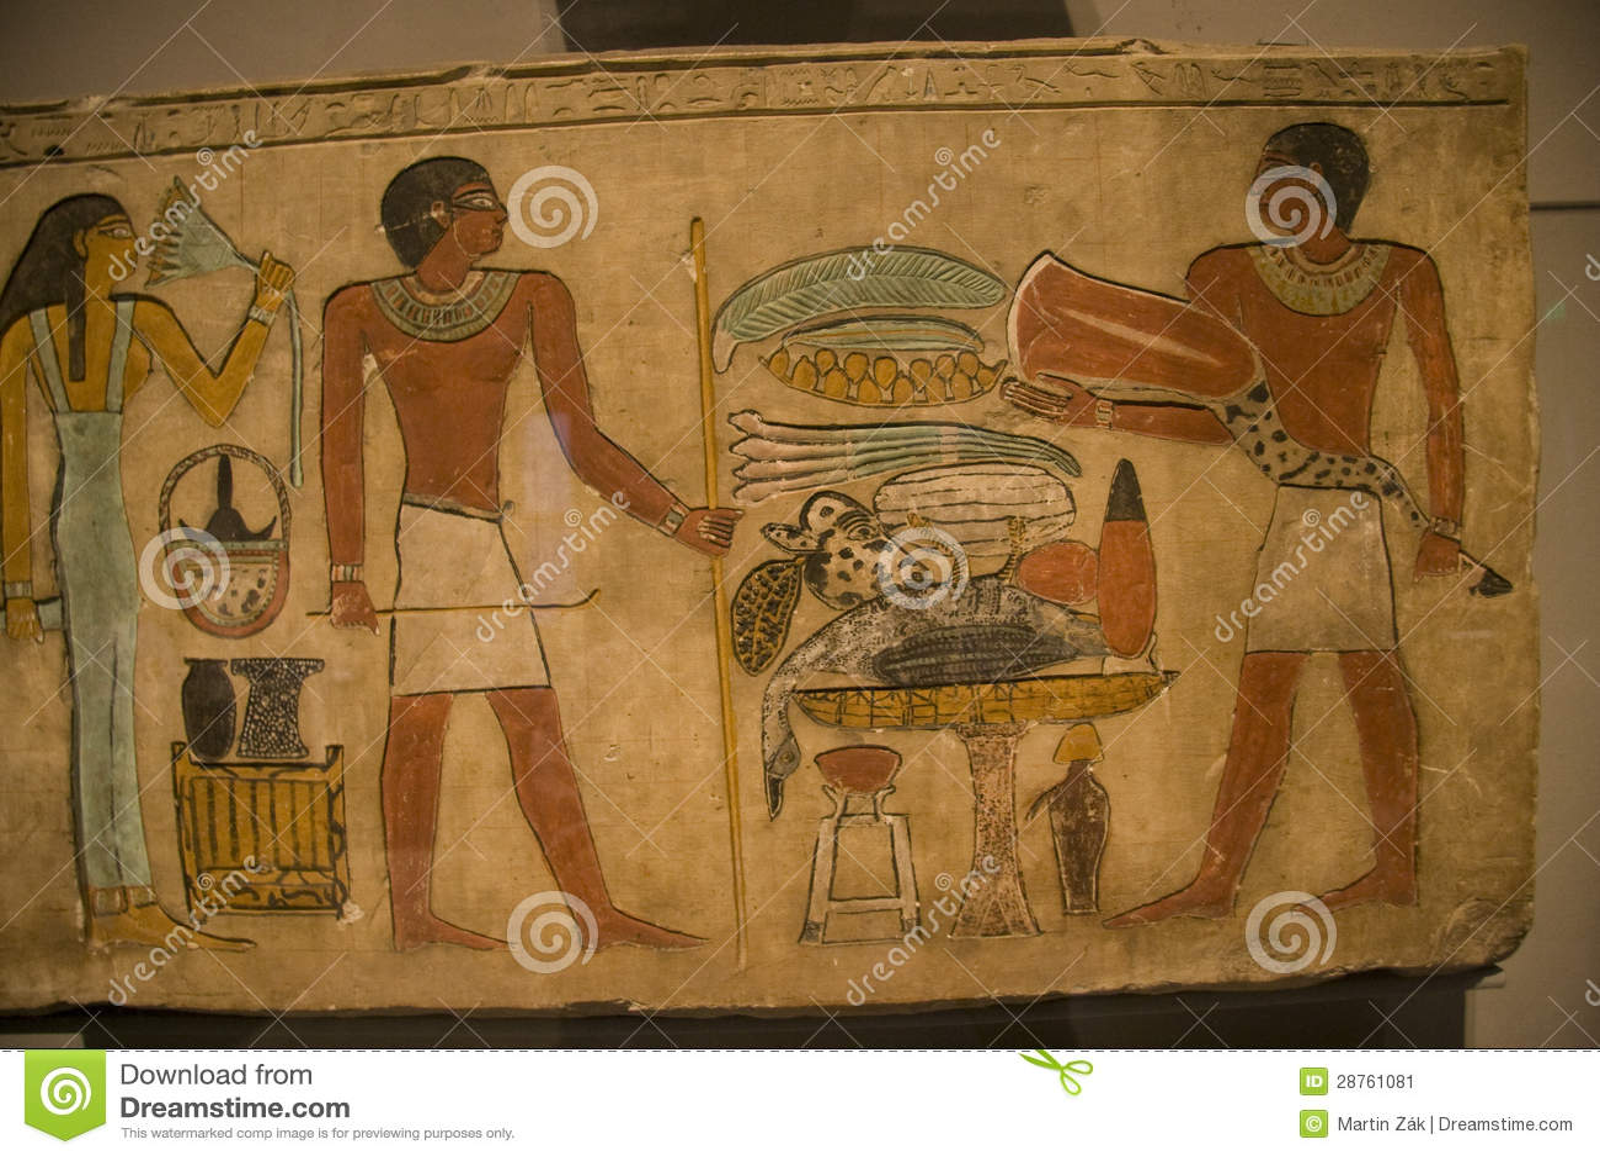 KHM Ägypten Ausstellung - alte Kunst